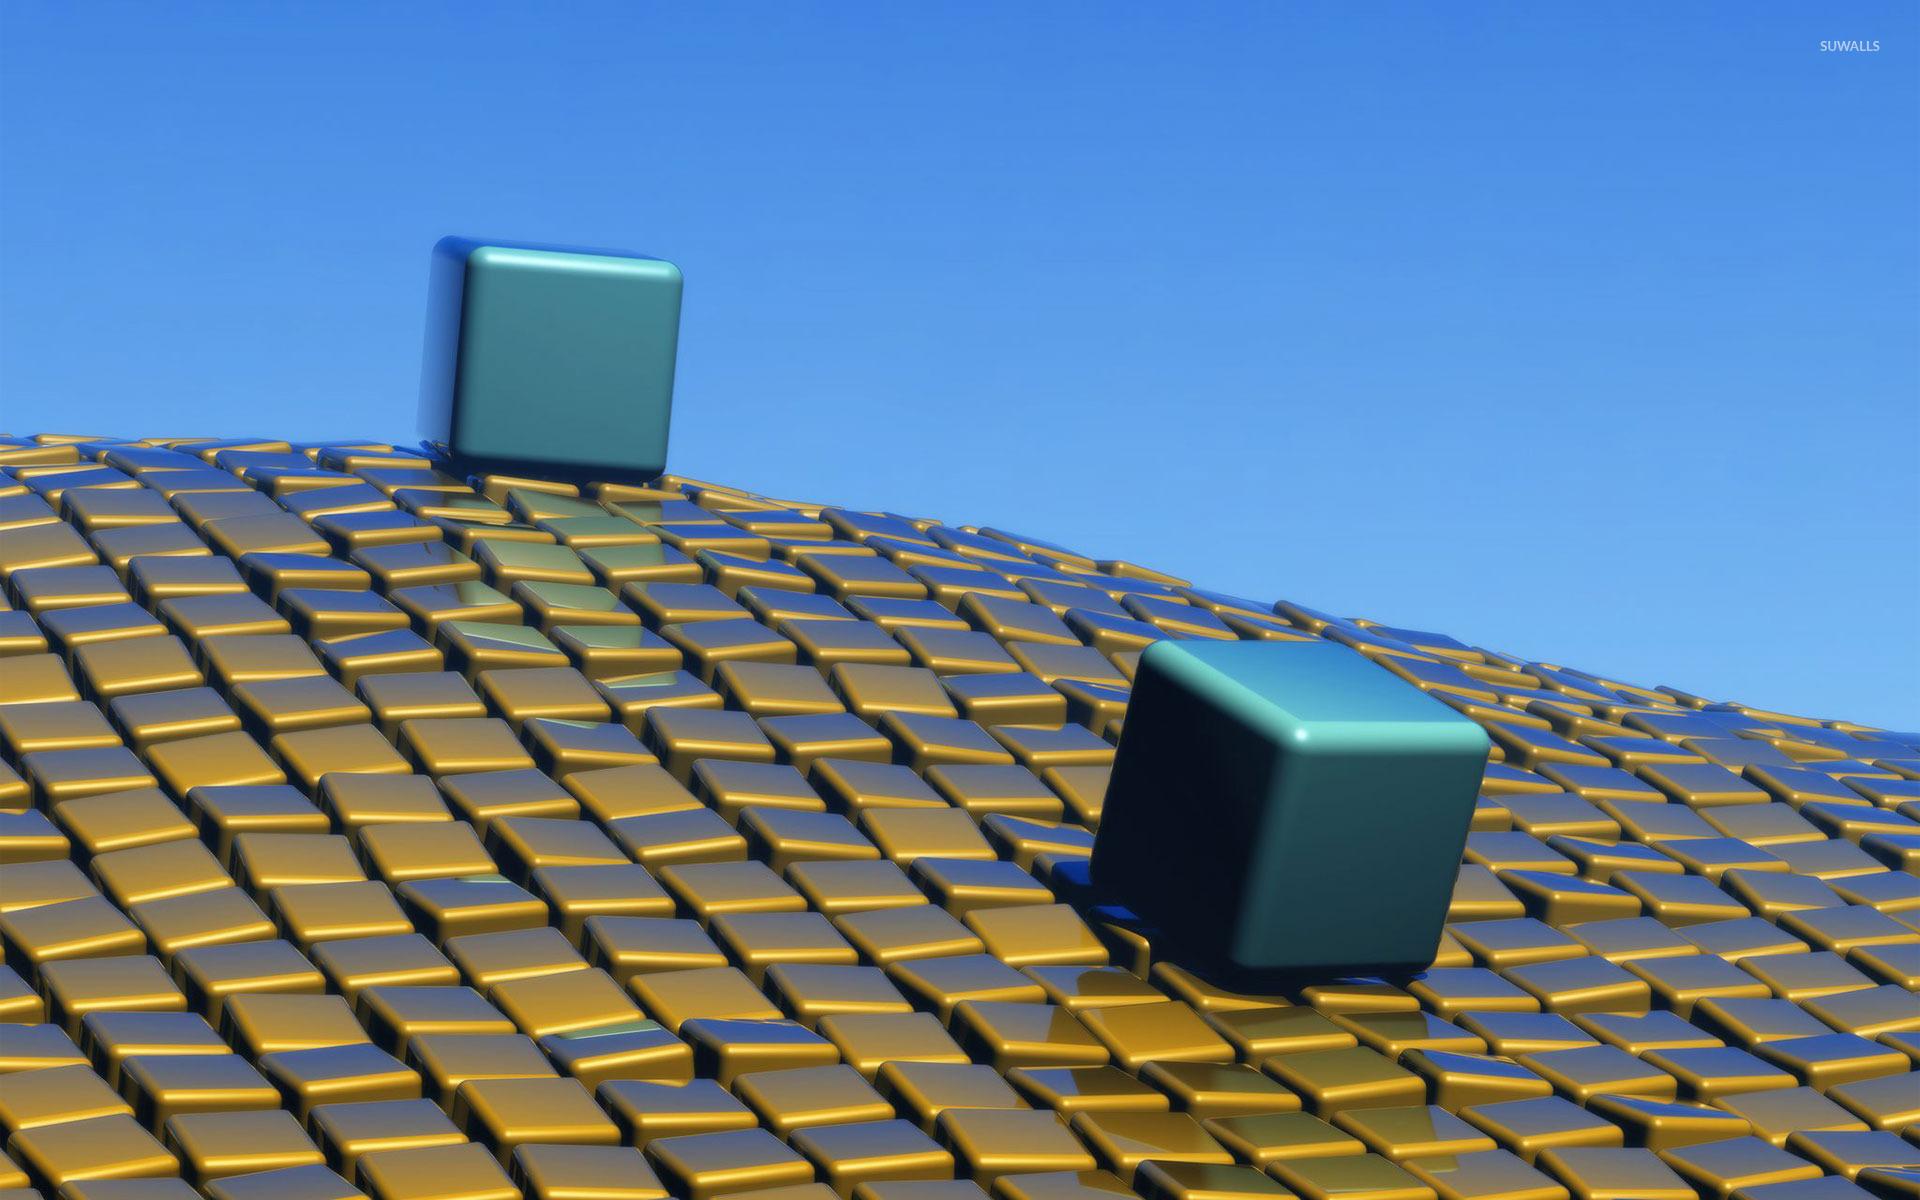 Cubes on wavy cube floor wallpaper 3d wallpapers 24207 for 3d wallpaper for home floor